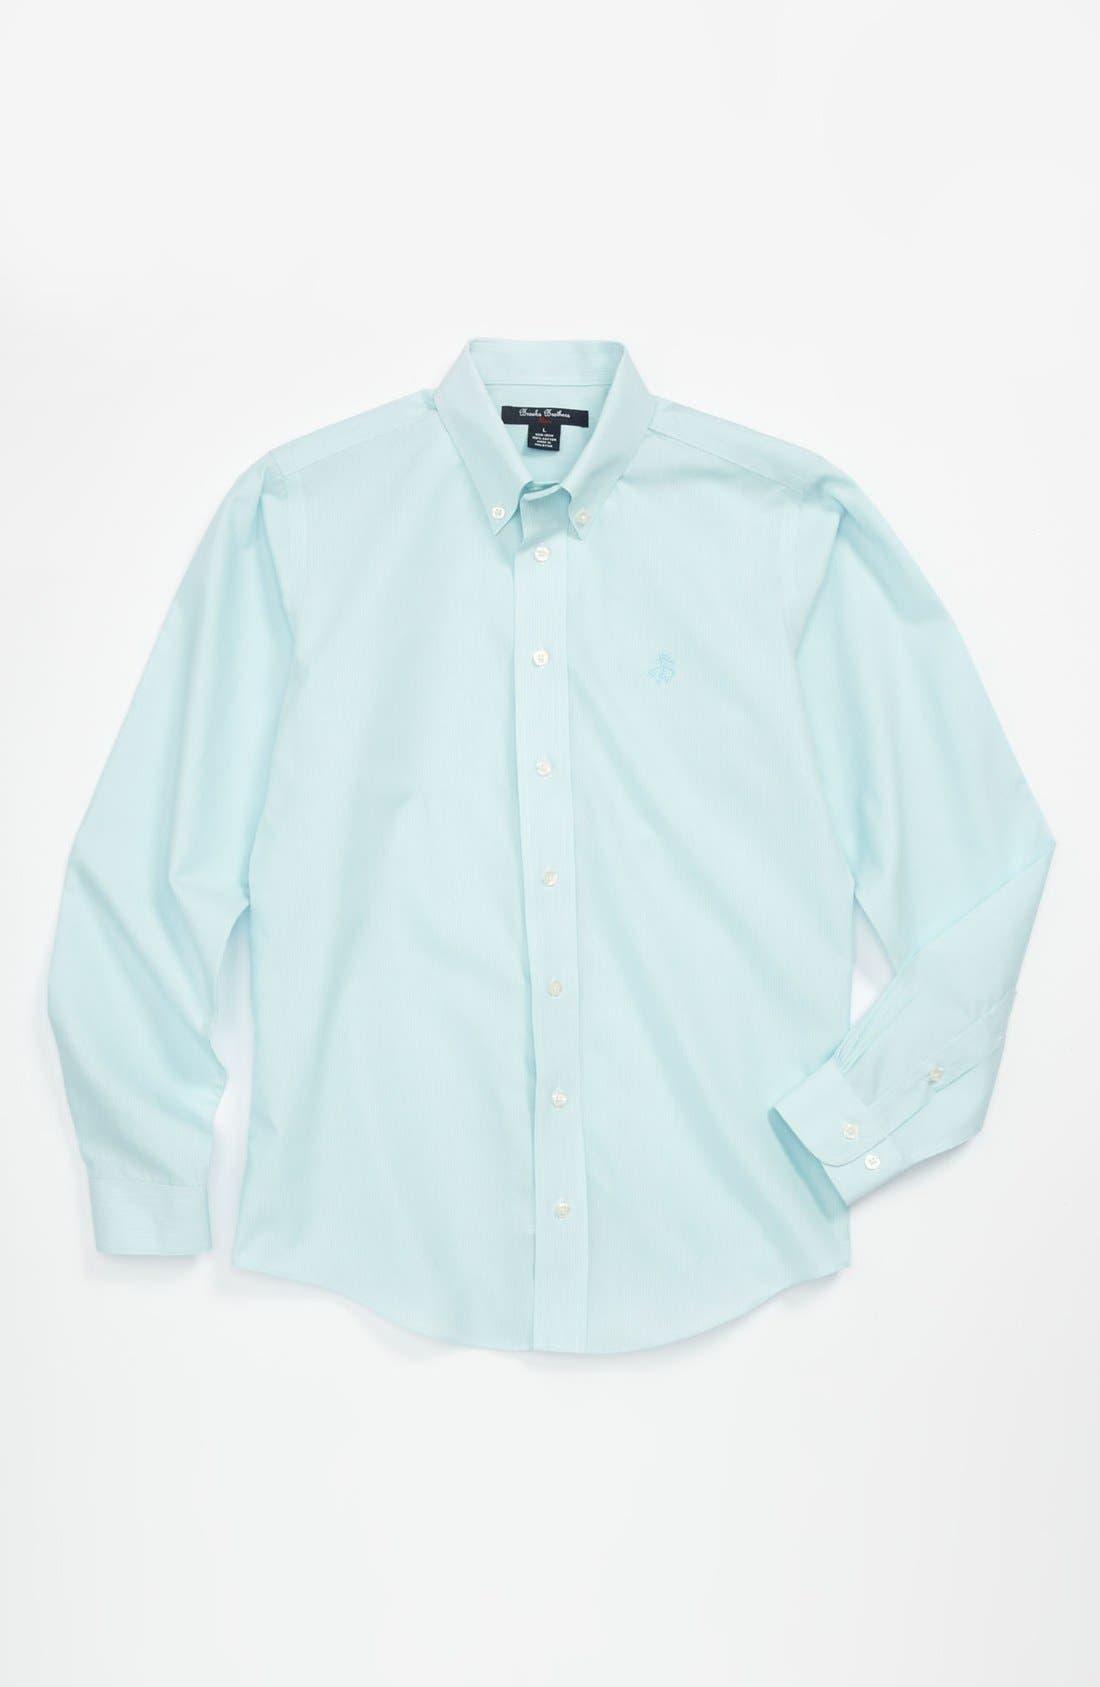 Alternate Image 1 Selected - Brooks Brothers Non-Iron Sport Shirt (Big Boys)